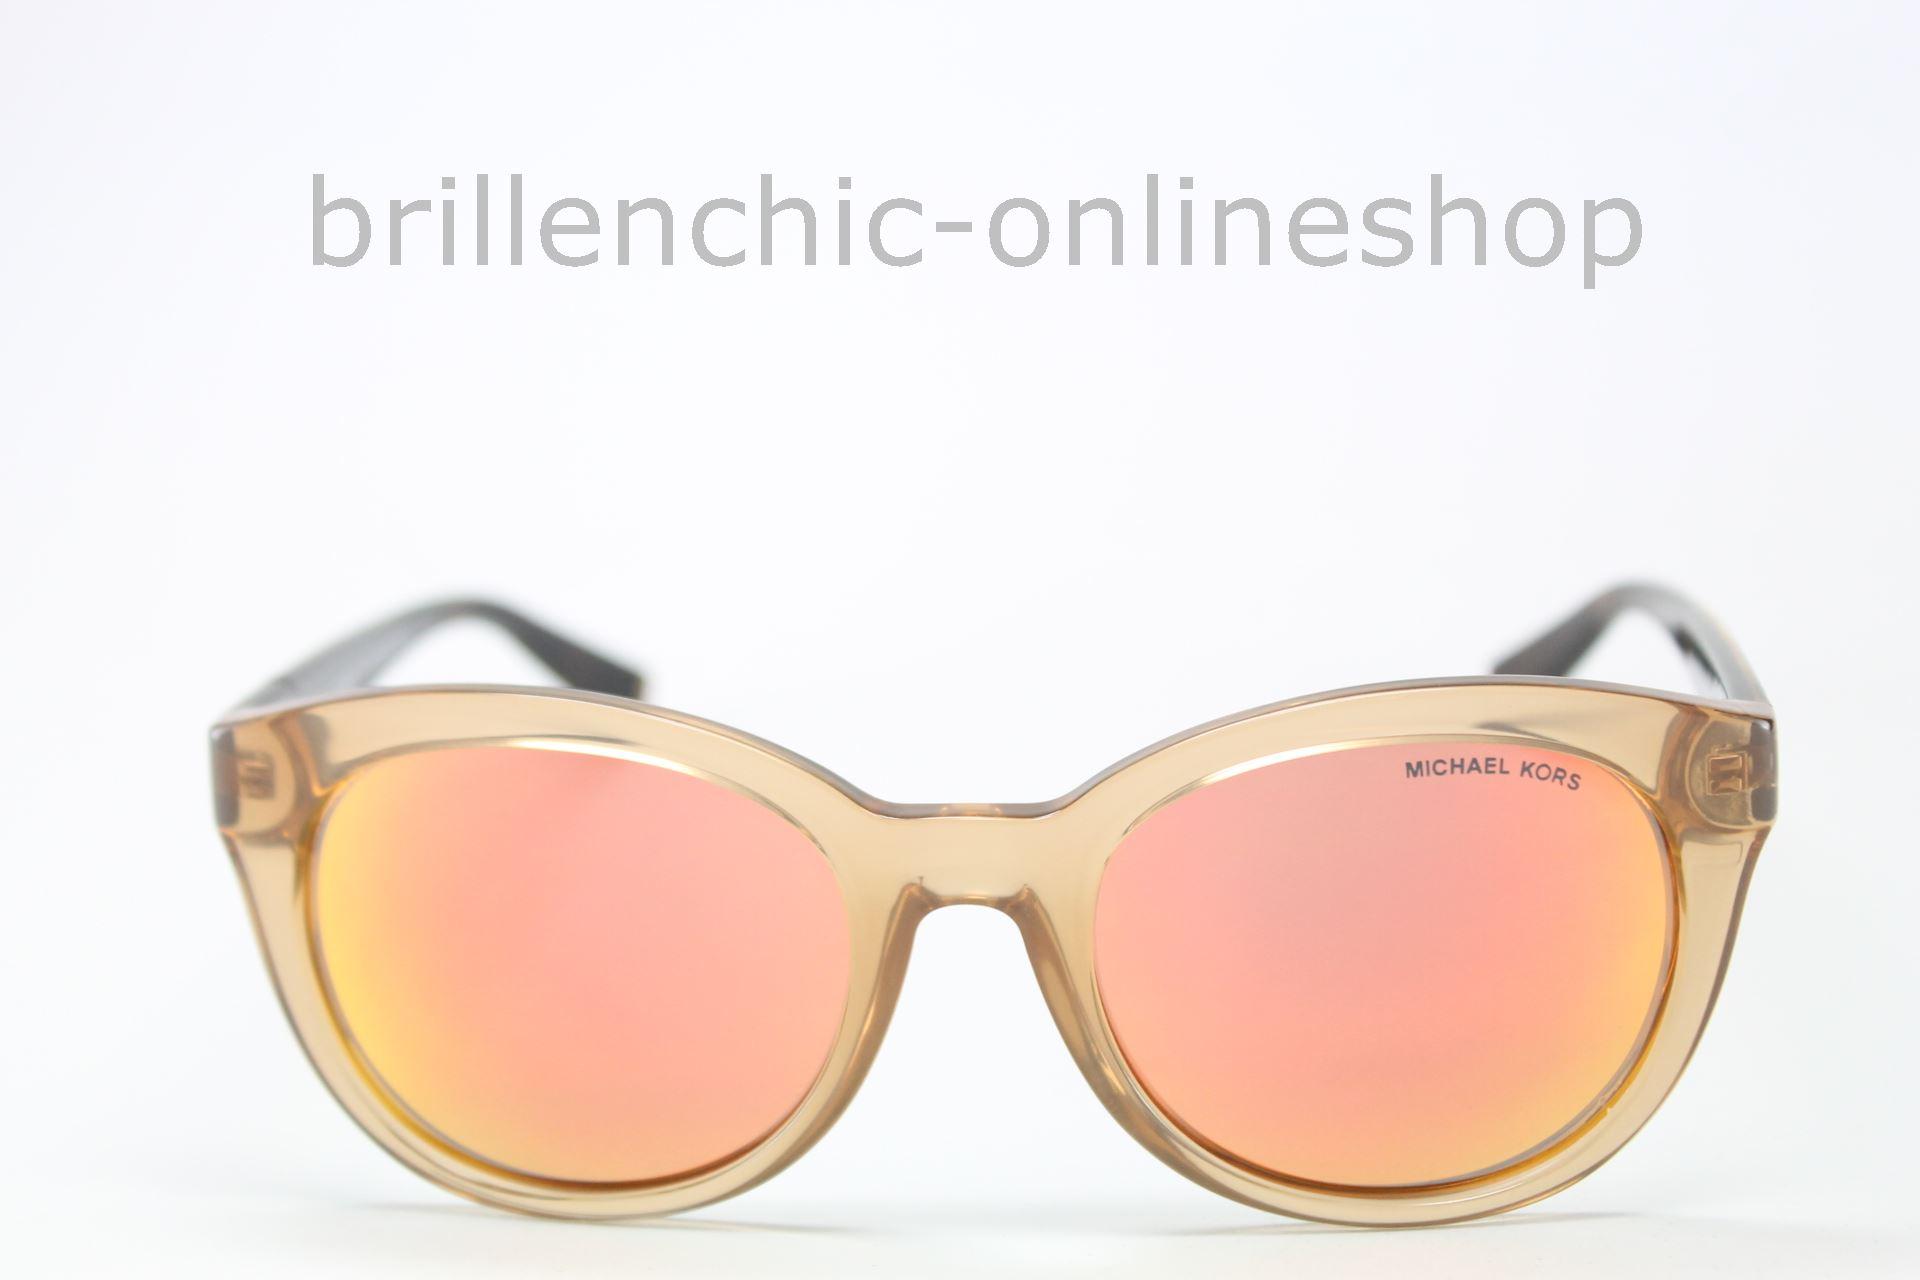 bfd2442cba66c Brillenchic-onlineshop in Berlin - MICHAEL KORS MK 6019 30516Q ...